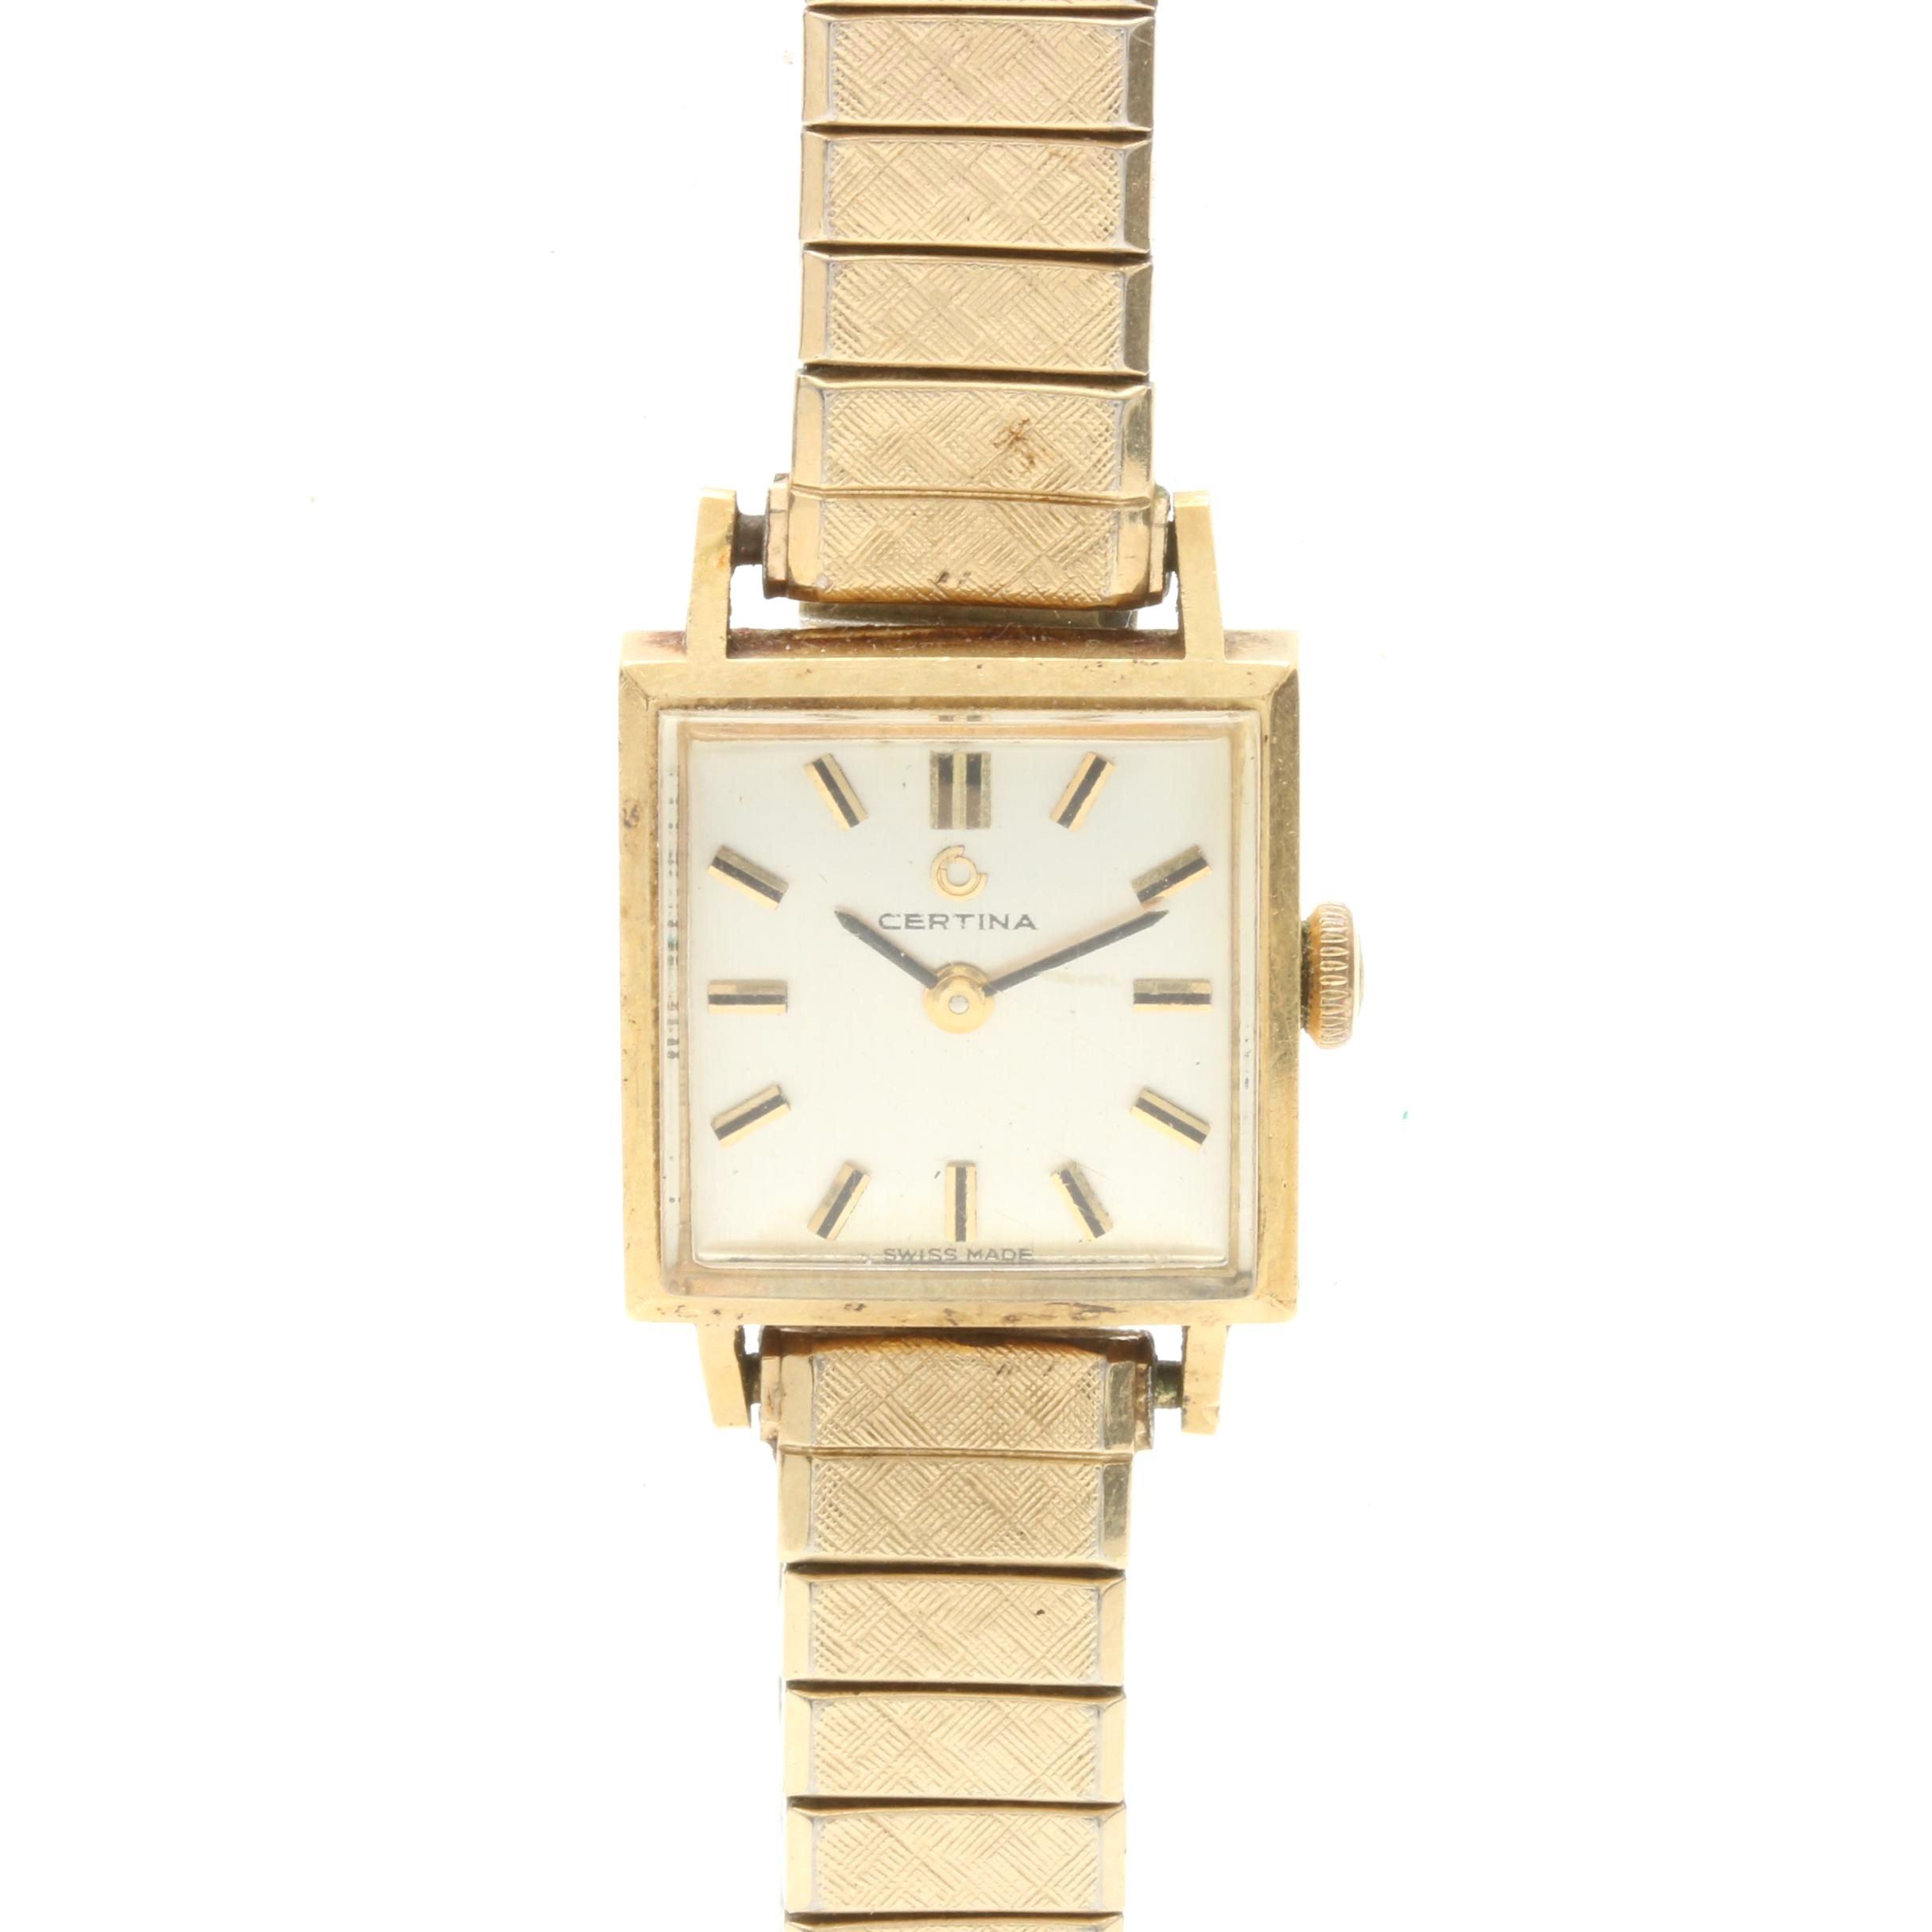 Vintage Certina 18K Yellow Gold Wristwatch